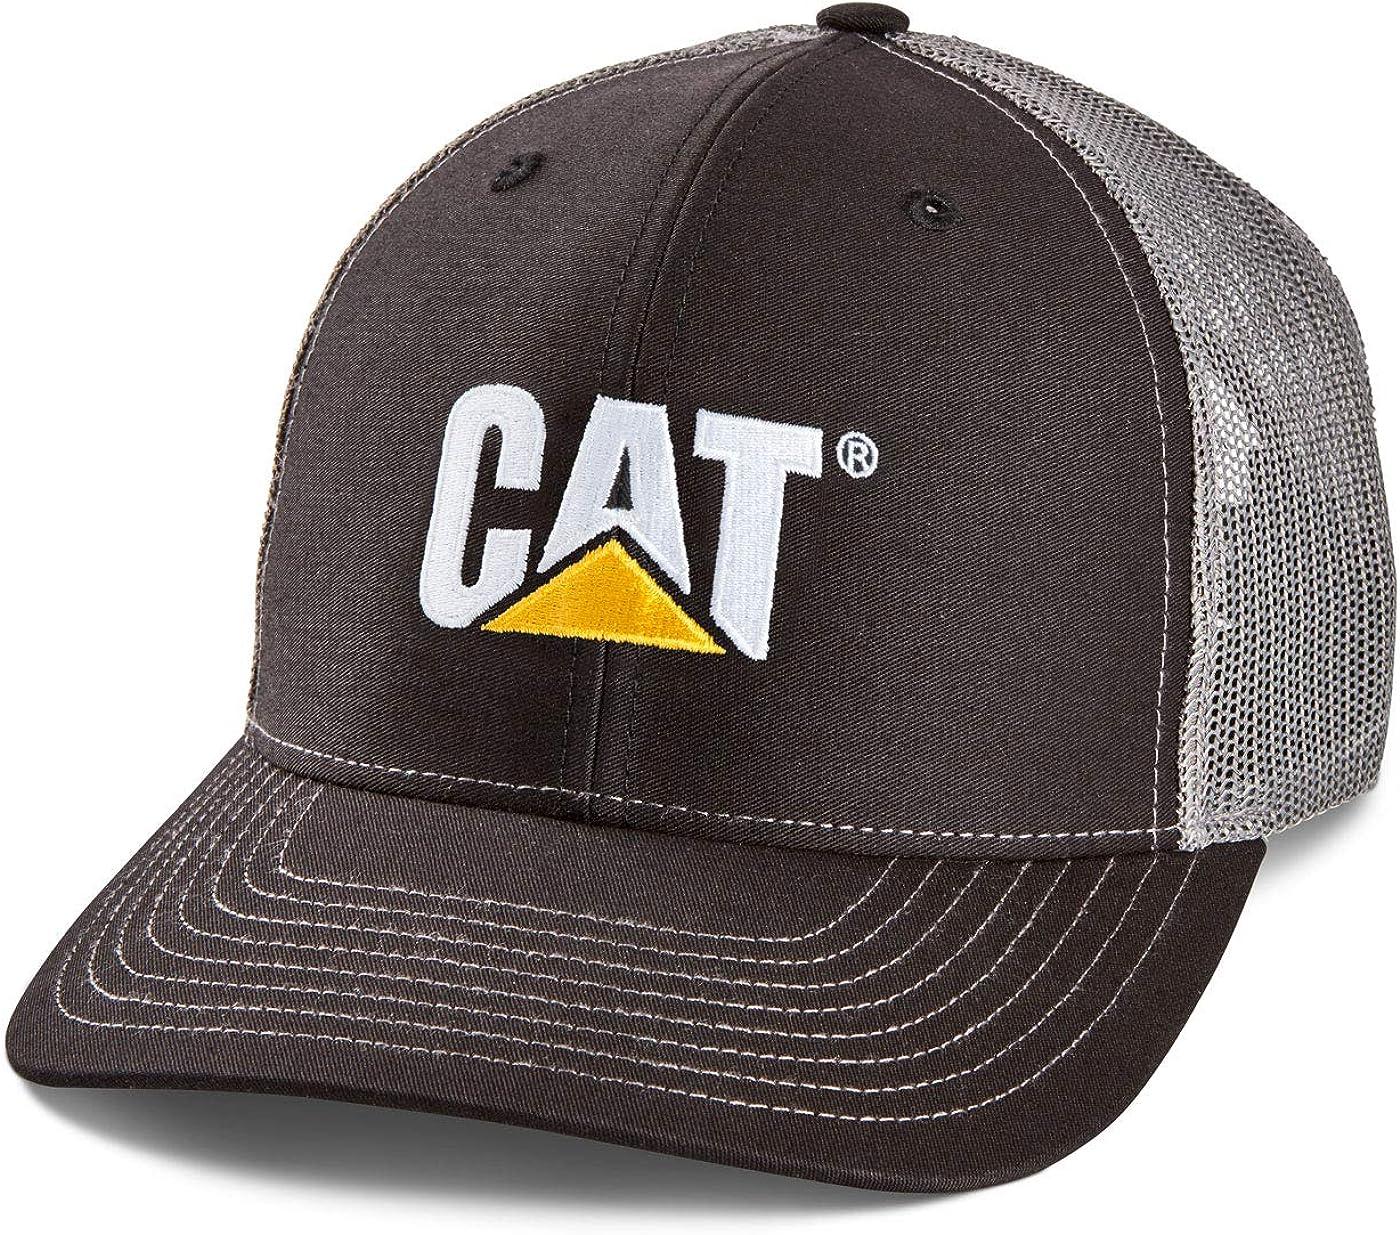 Caterpillar CAT Richardson Black/Mesh Snapback Hat Cap